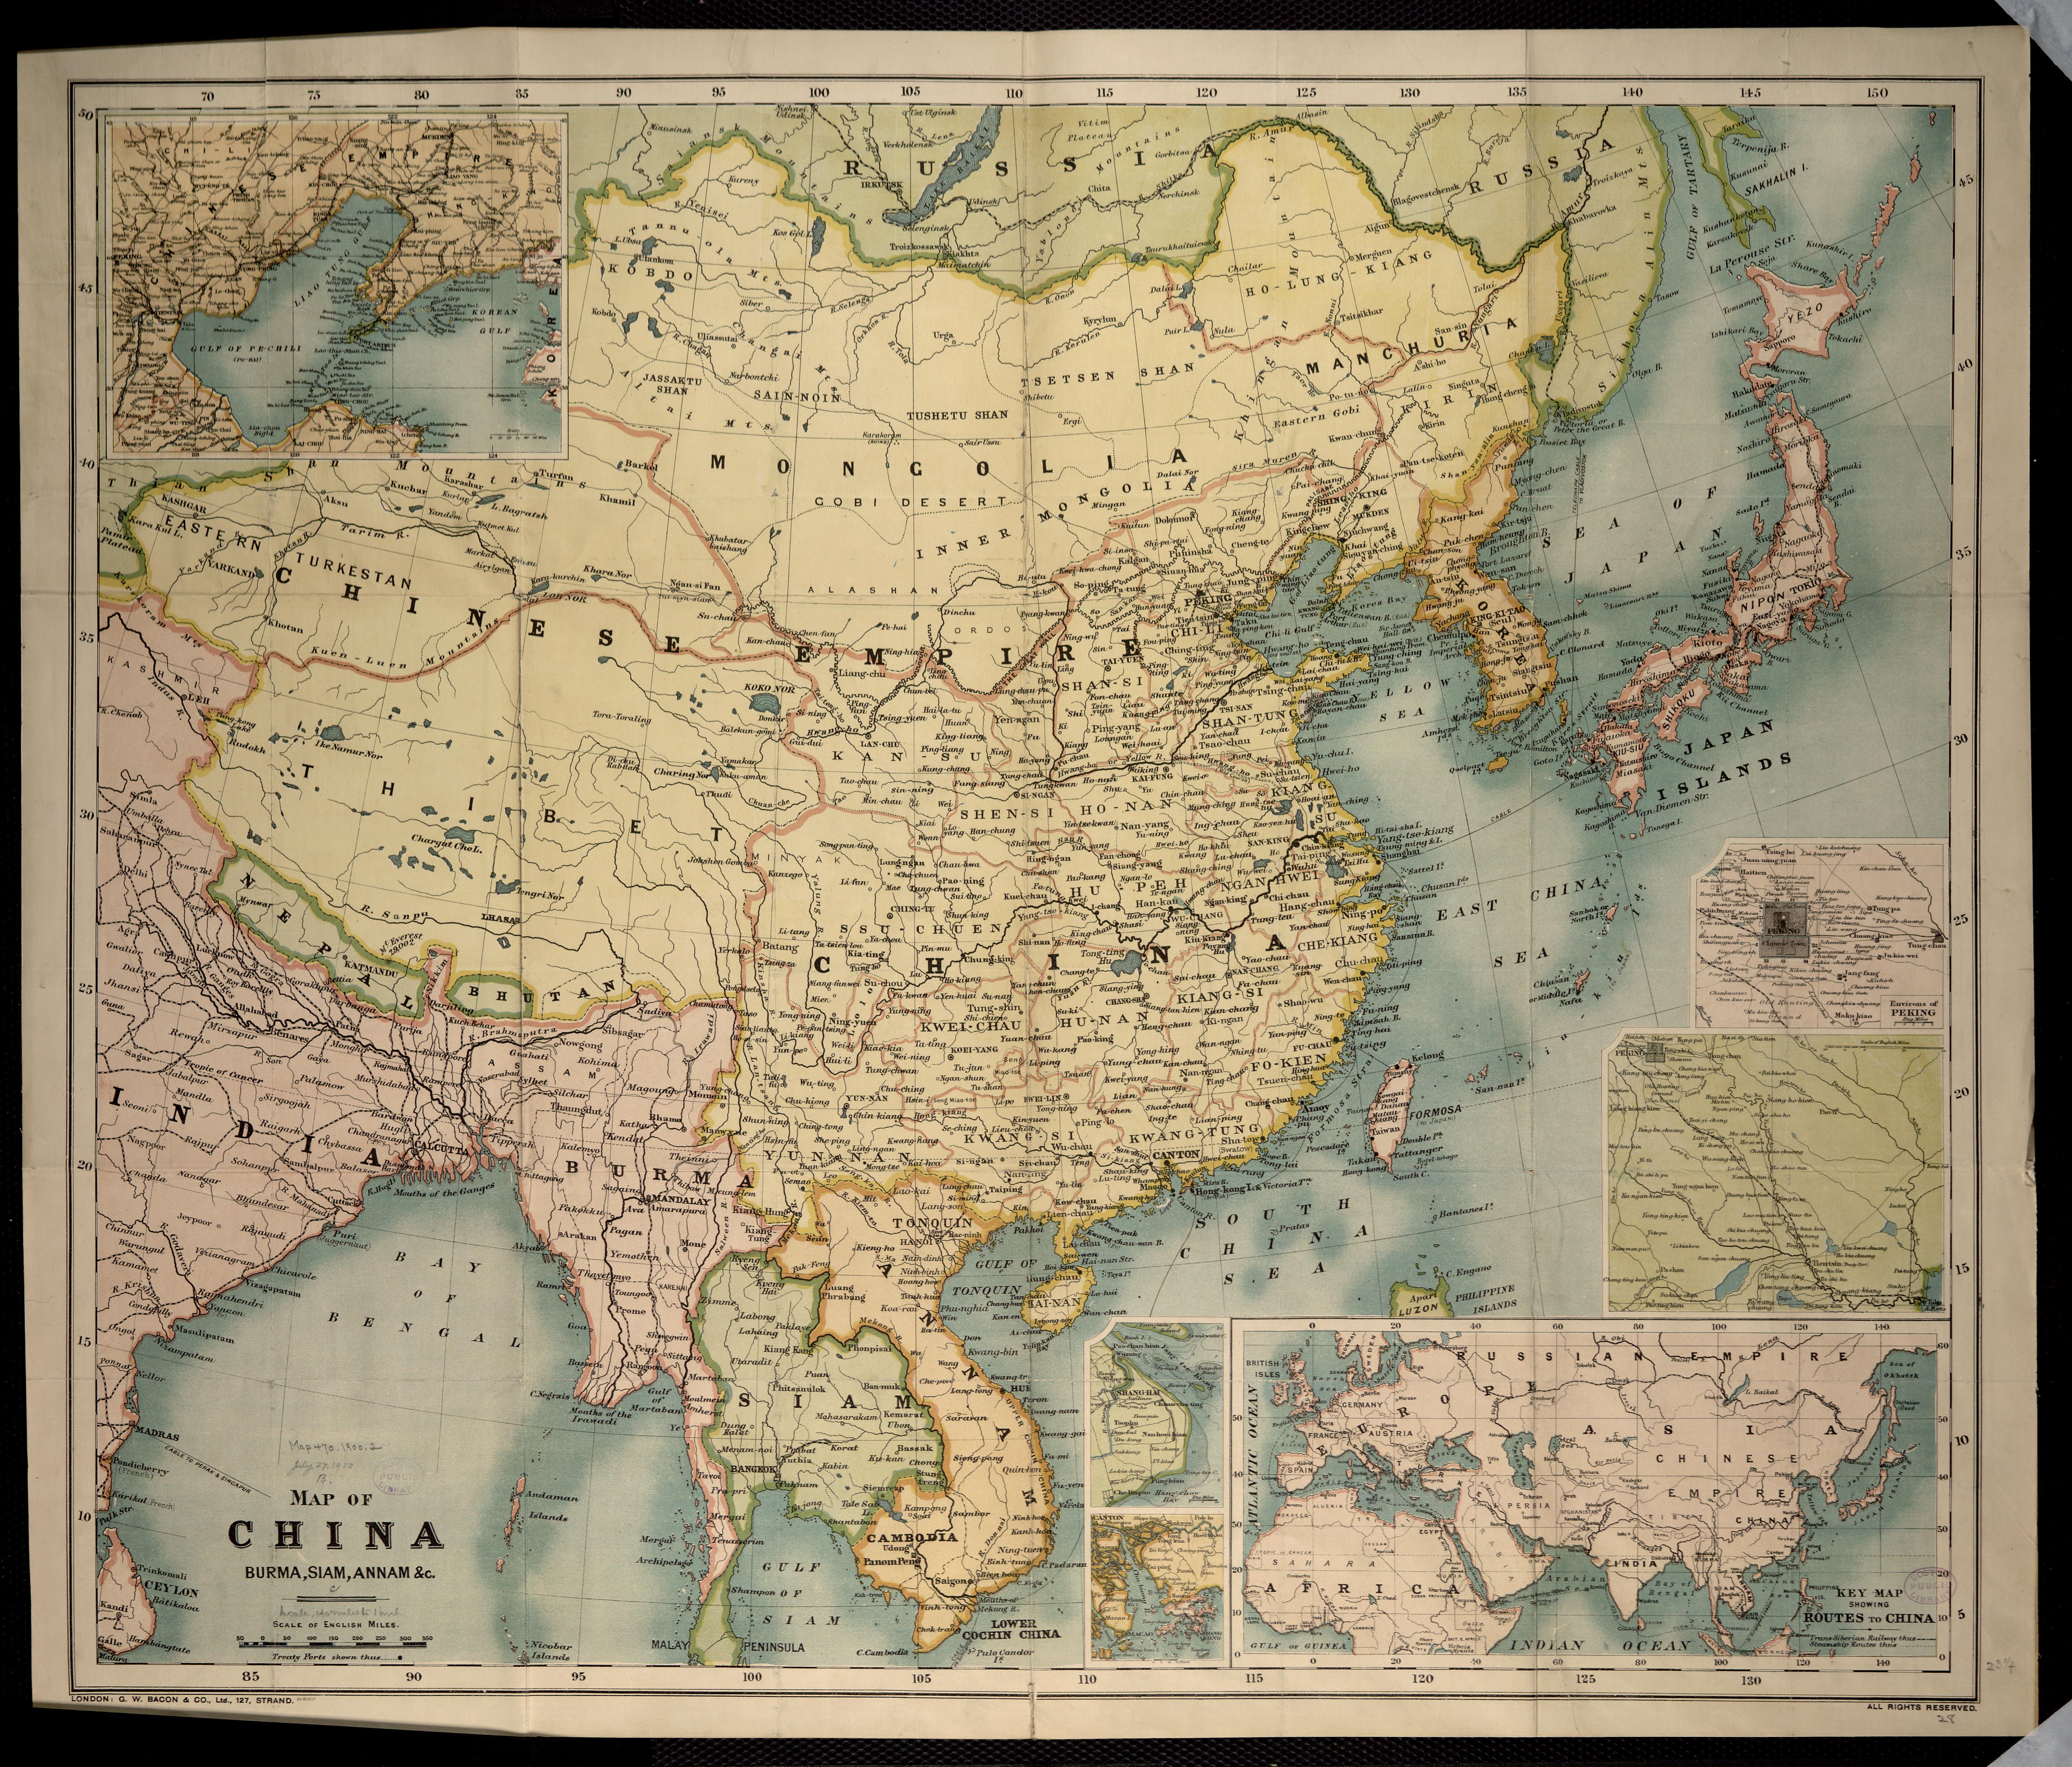 Map_of_China%2C_Burma%2C_Siam%2C_Annam_%26c._%285555857345%29 George Washington Map on peter jefferson map, abraham lincoln map, longfellow map, washington's map, new york senate map, thomas jefferson map, columbus washington map, america's byways map, the great compromise map, mark twain map, abigail adams map, john wayne map, franklin roosevelt map, trade center map, gwu map, andrew jackson map, lumberman's monument map, robert frost map, battle of fort necessity map, battles of lexington and concord map,